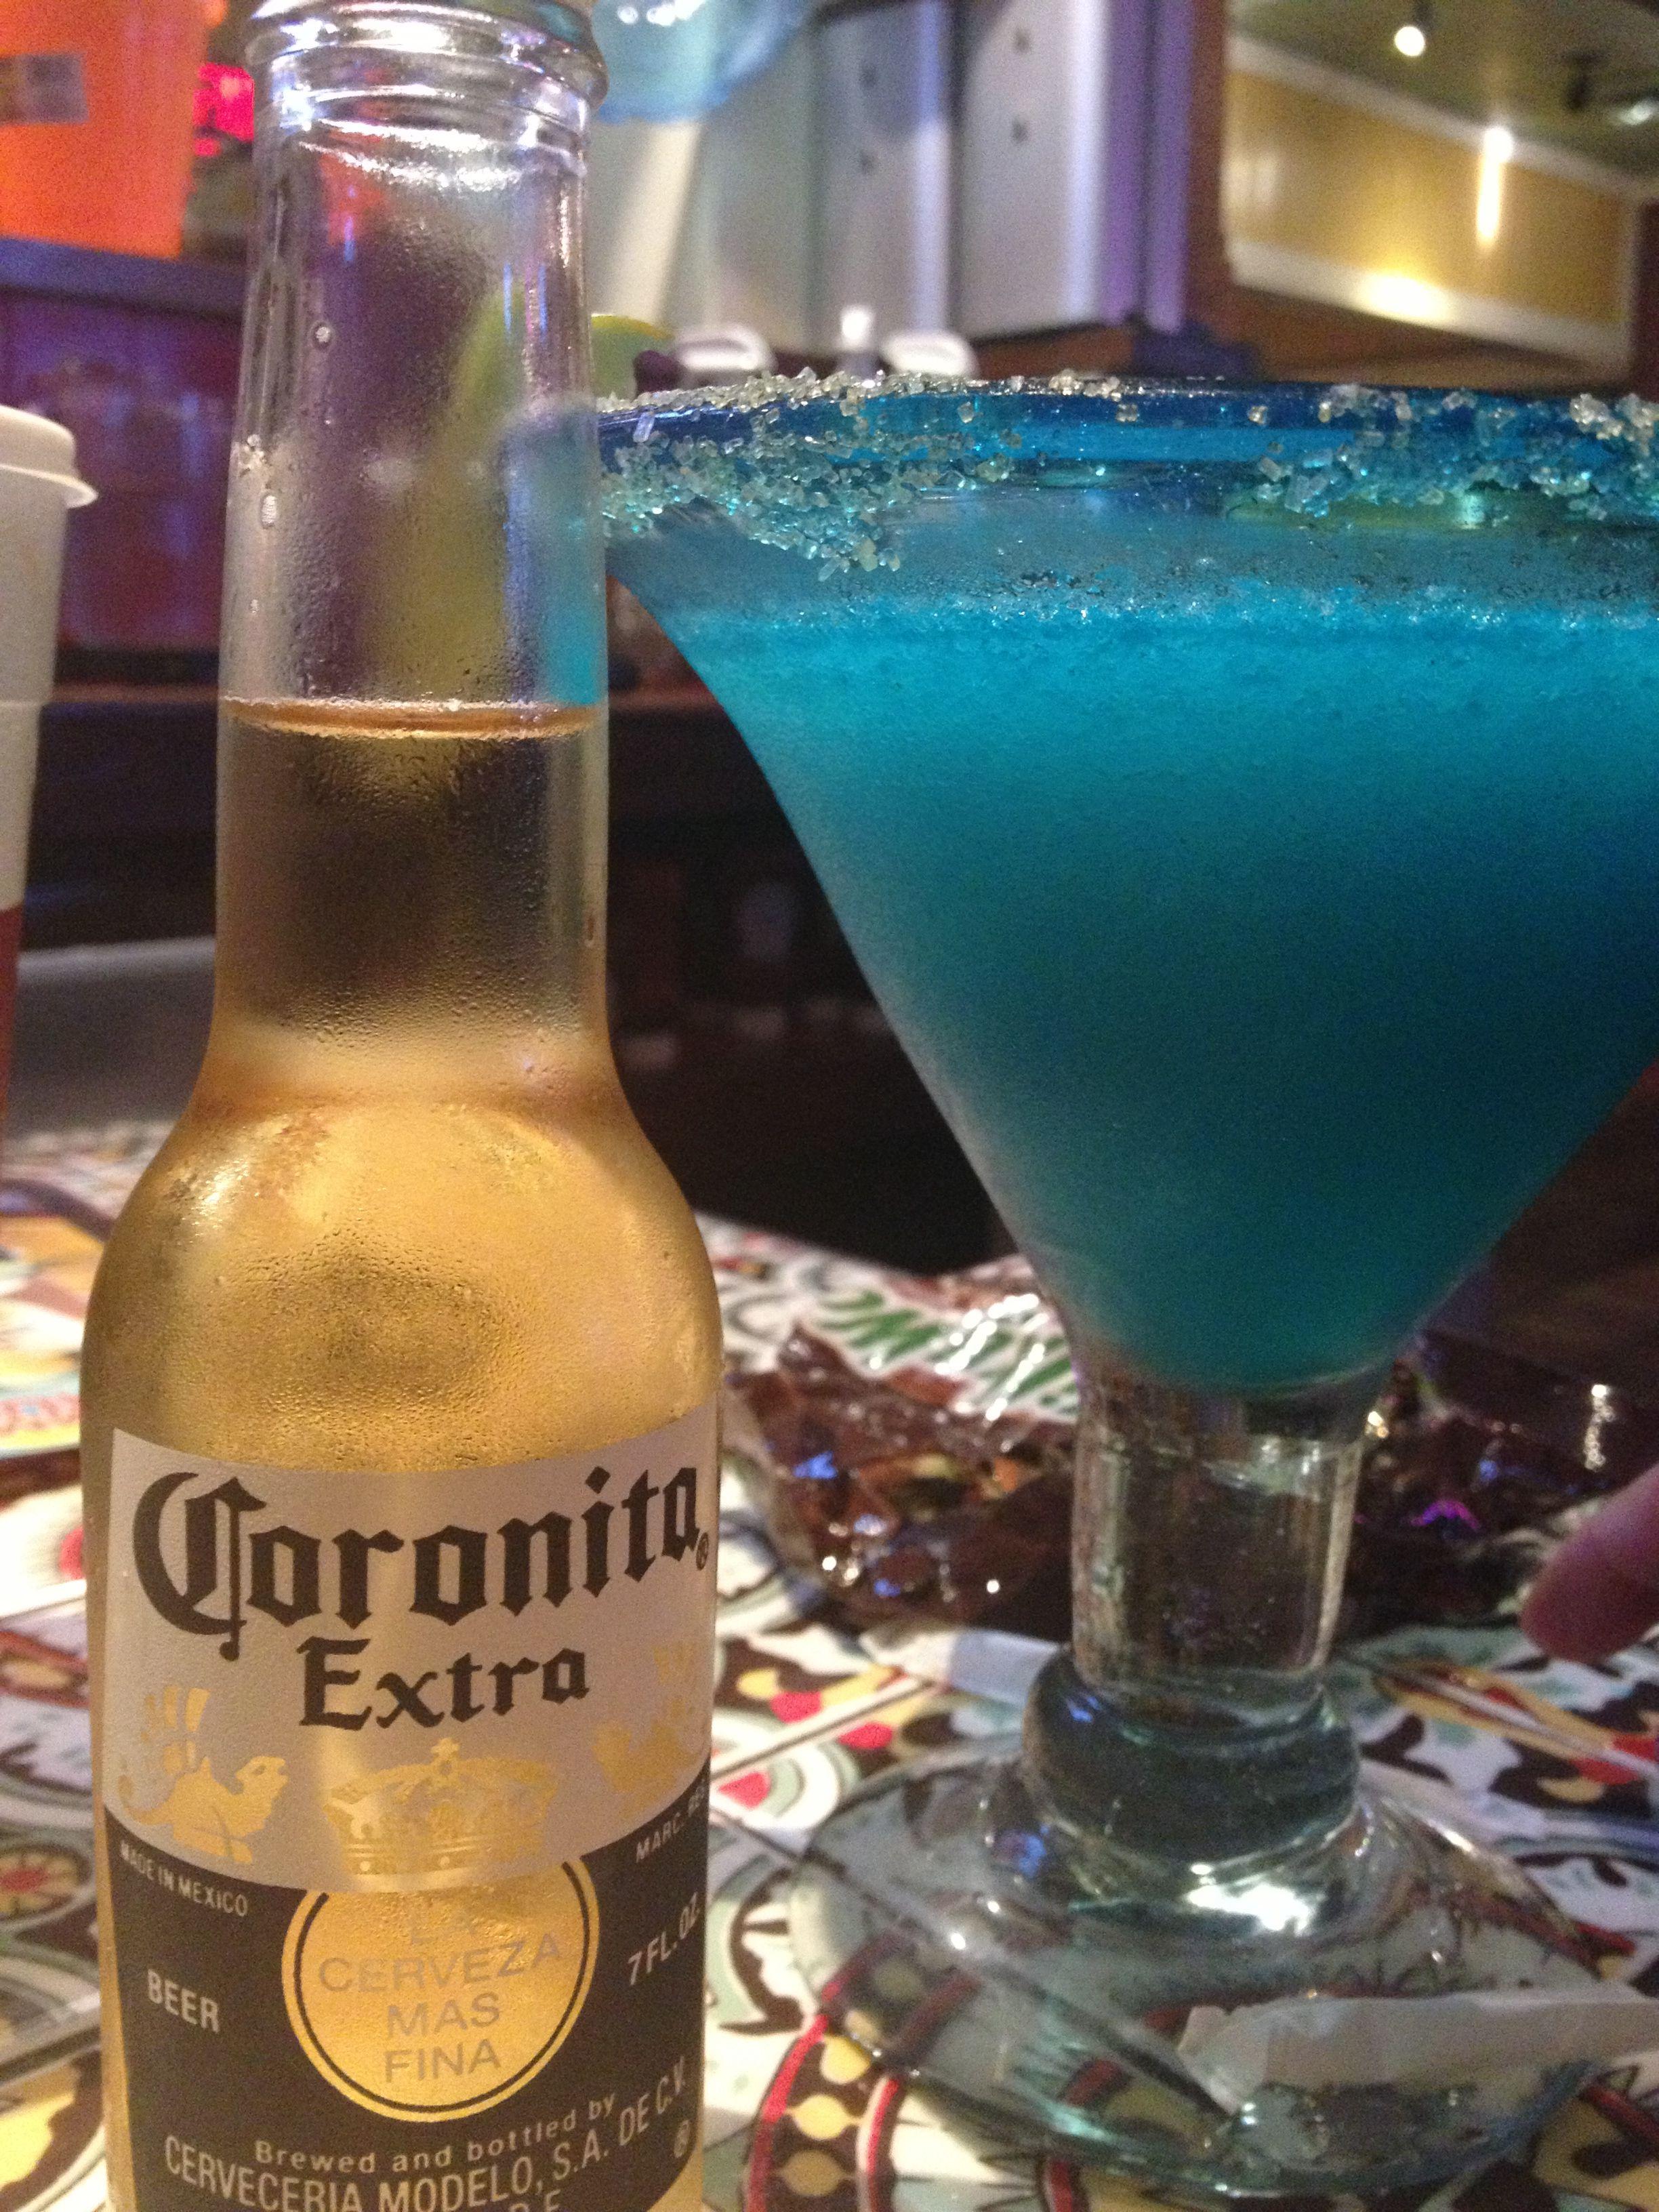 Blue Raz Corona Rita From Chili S Summer Drinks Corona Beer Bottle Beer Bottle